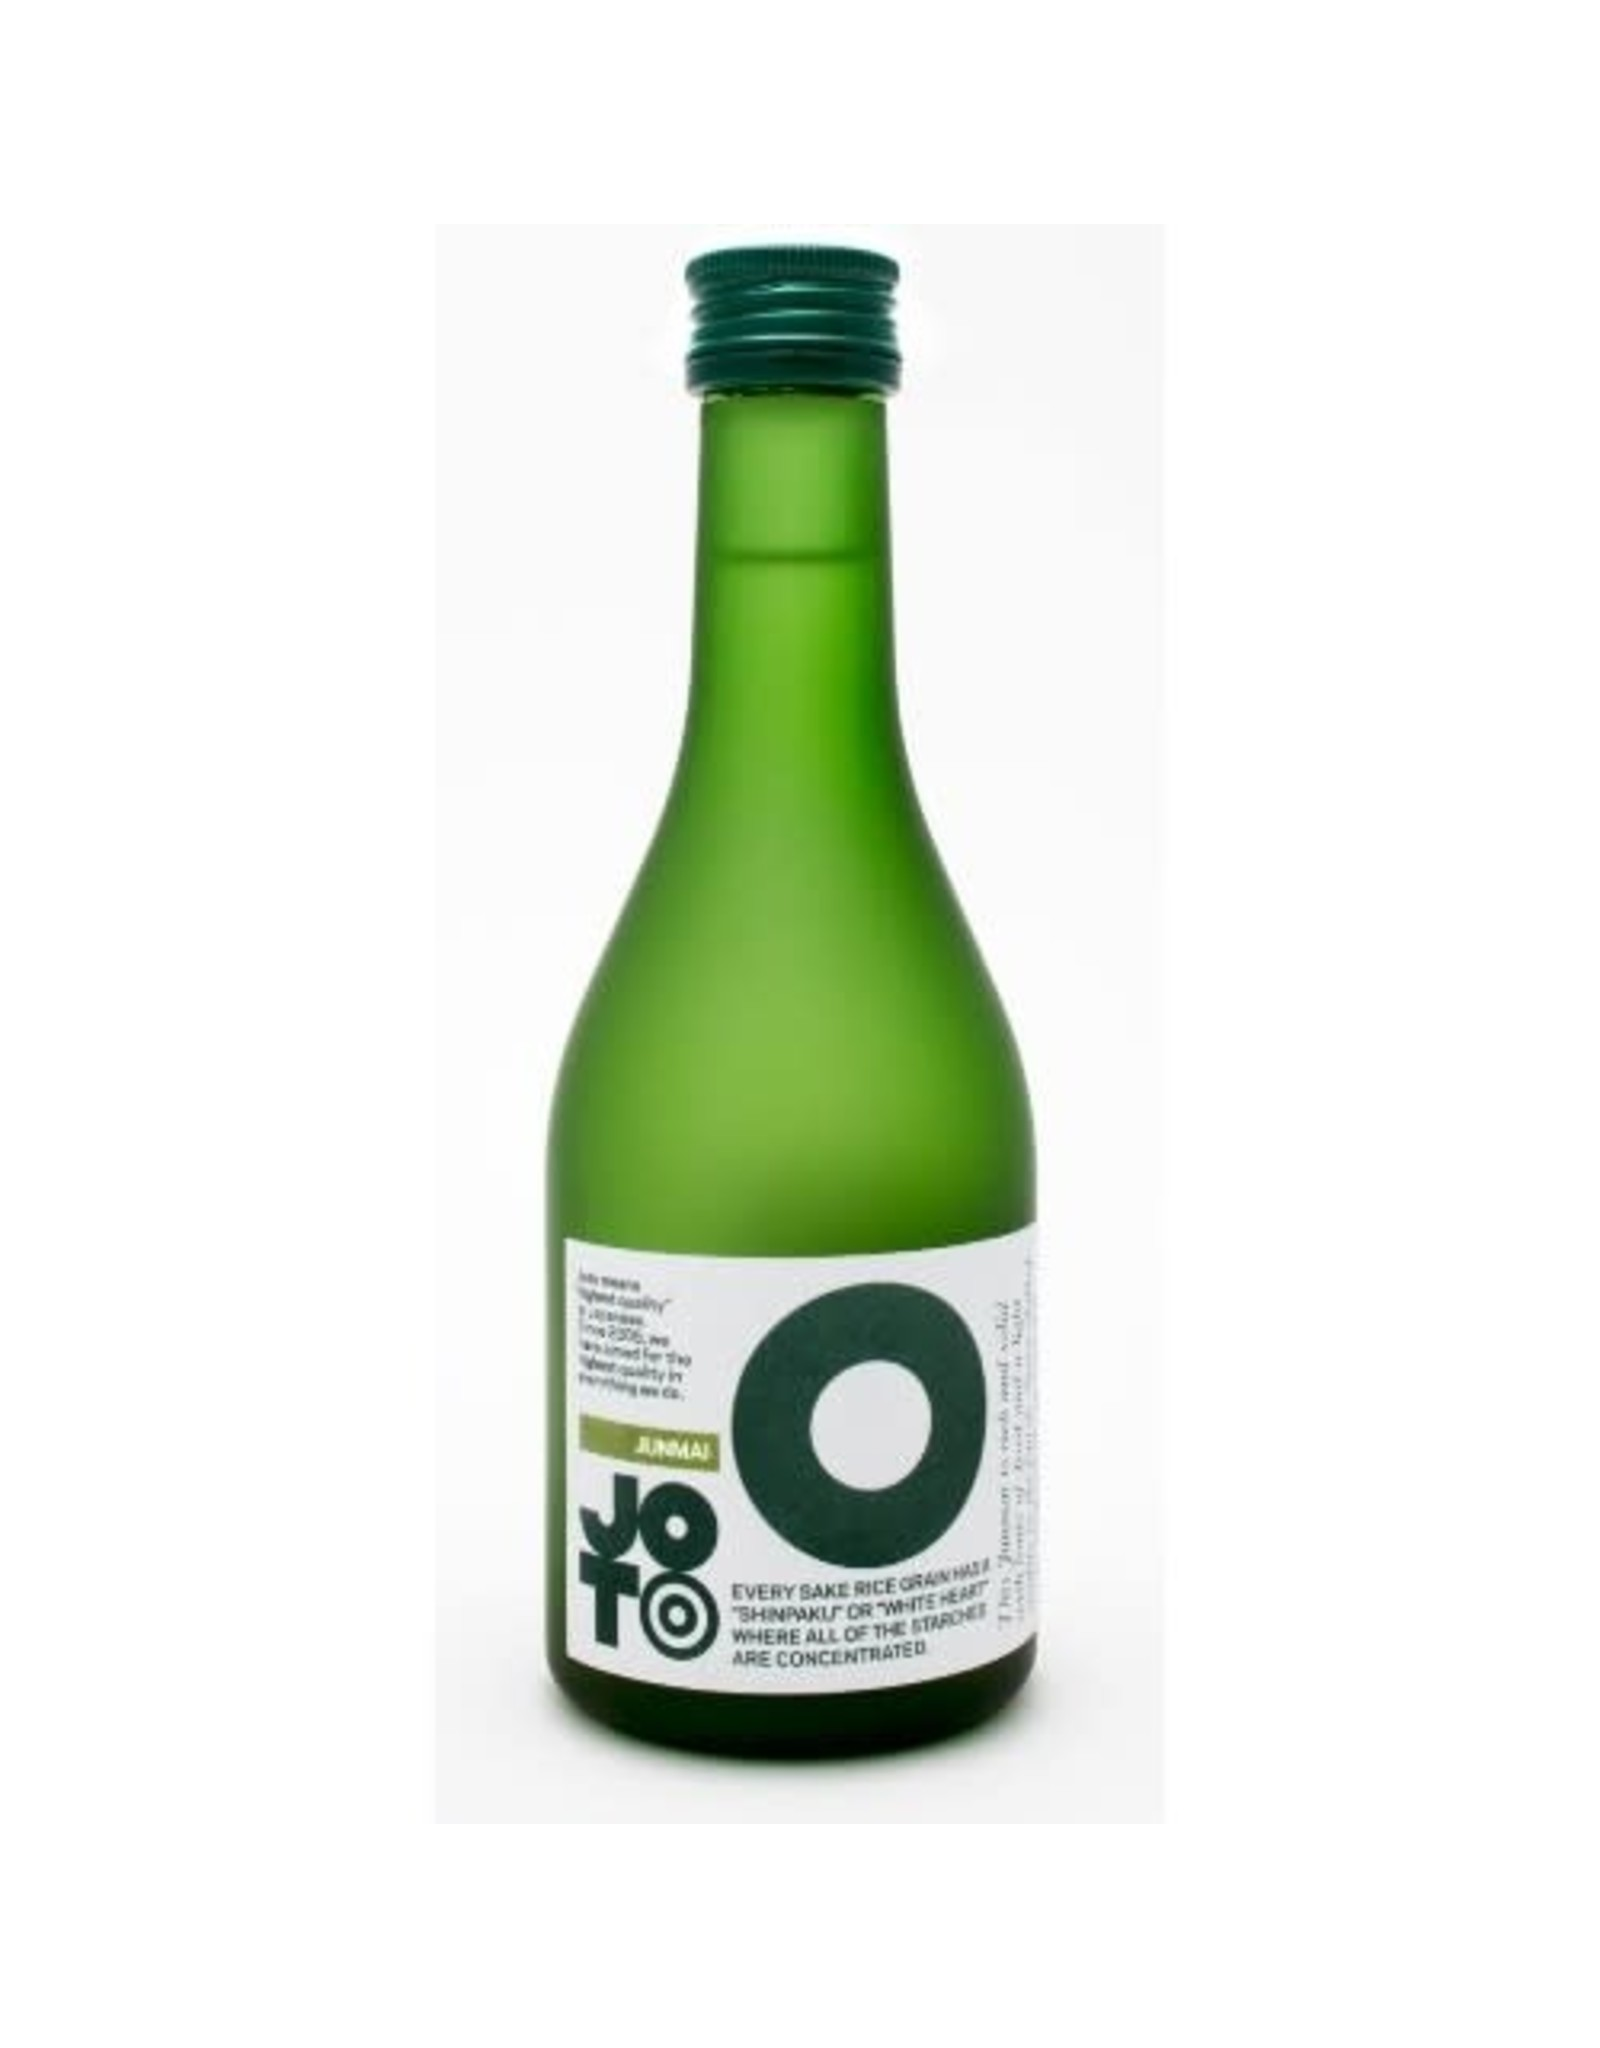 Joto Maboroshi Junmai Ginjo Sake